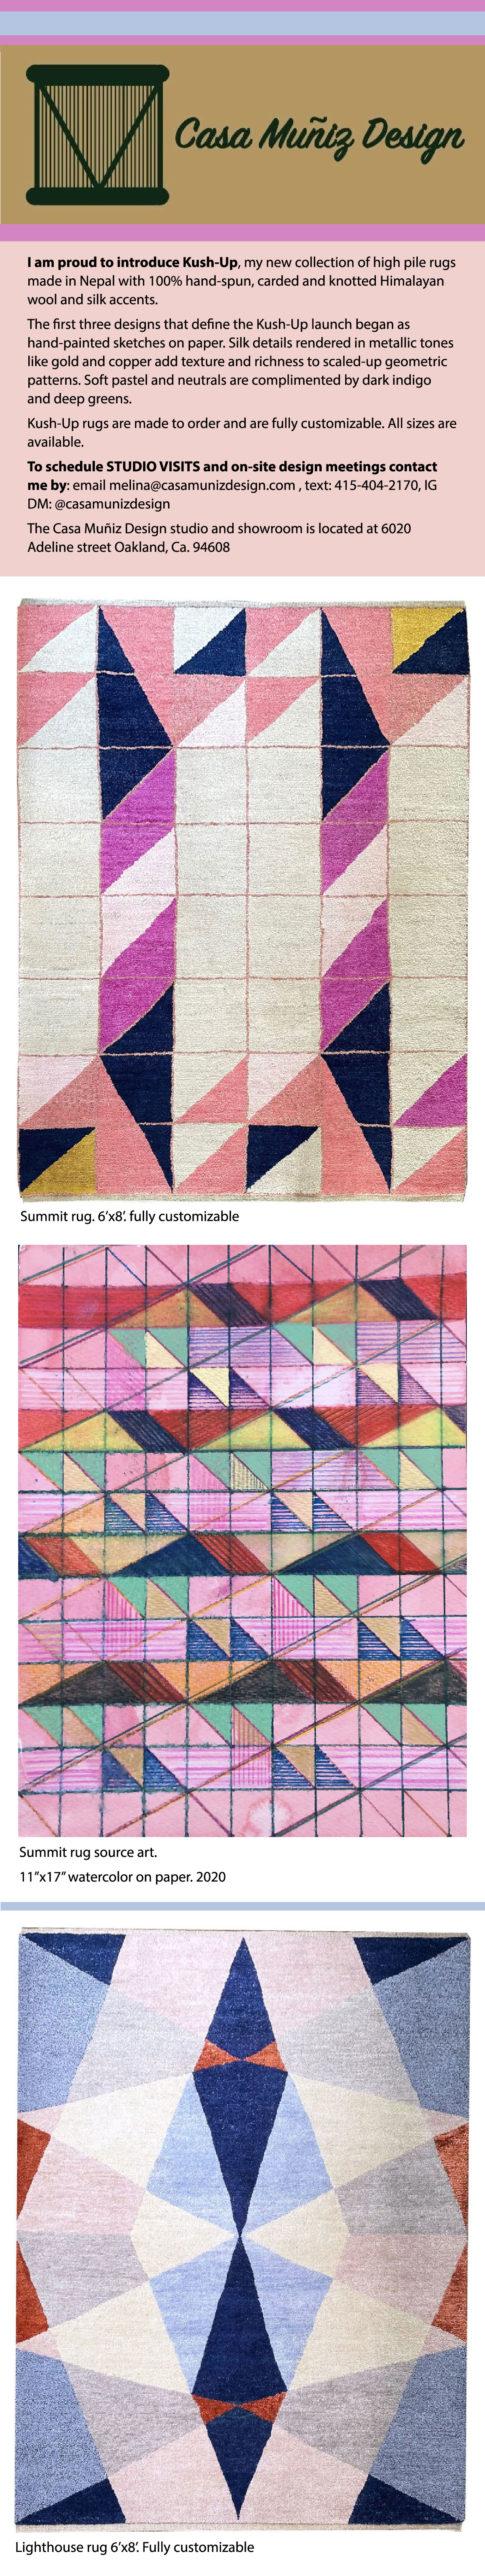 Casa Muñiz Design-Kush-Up: Hand-Knotted Shag rugs